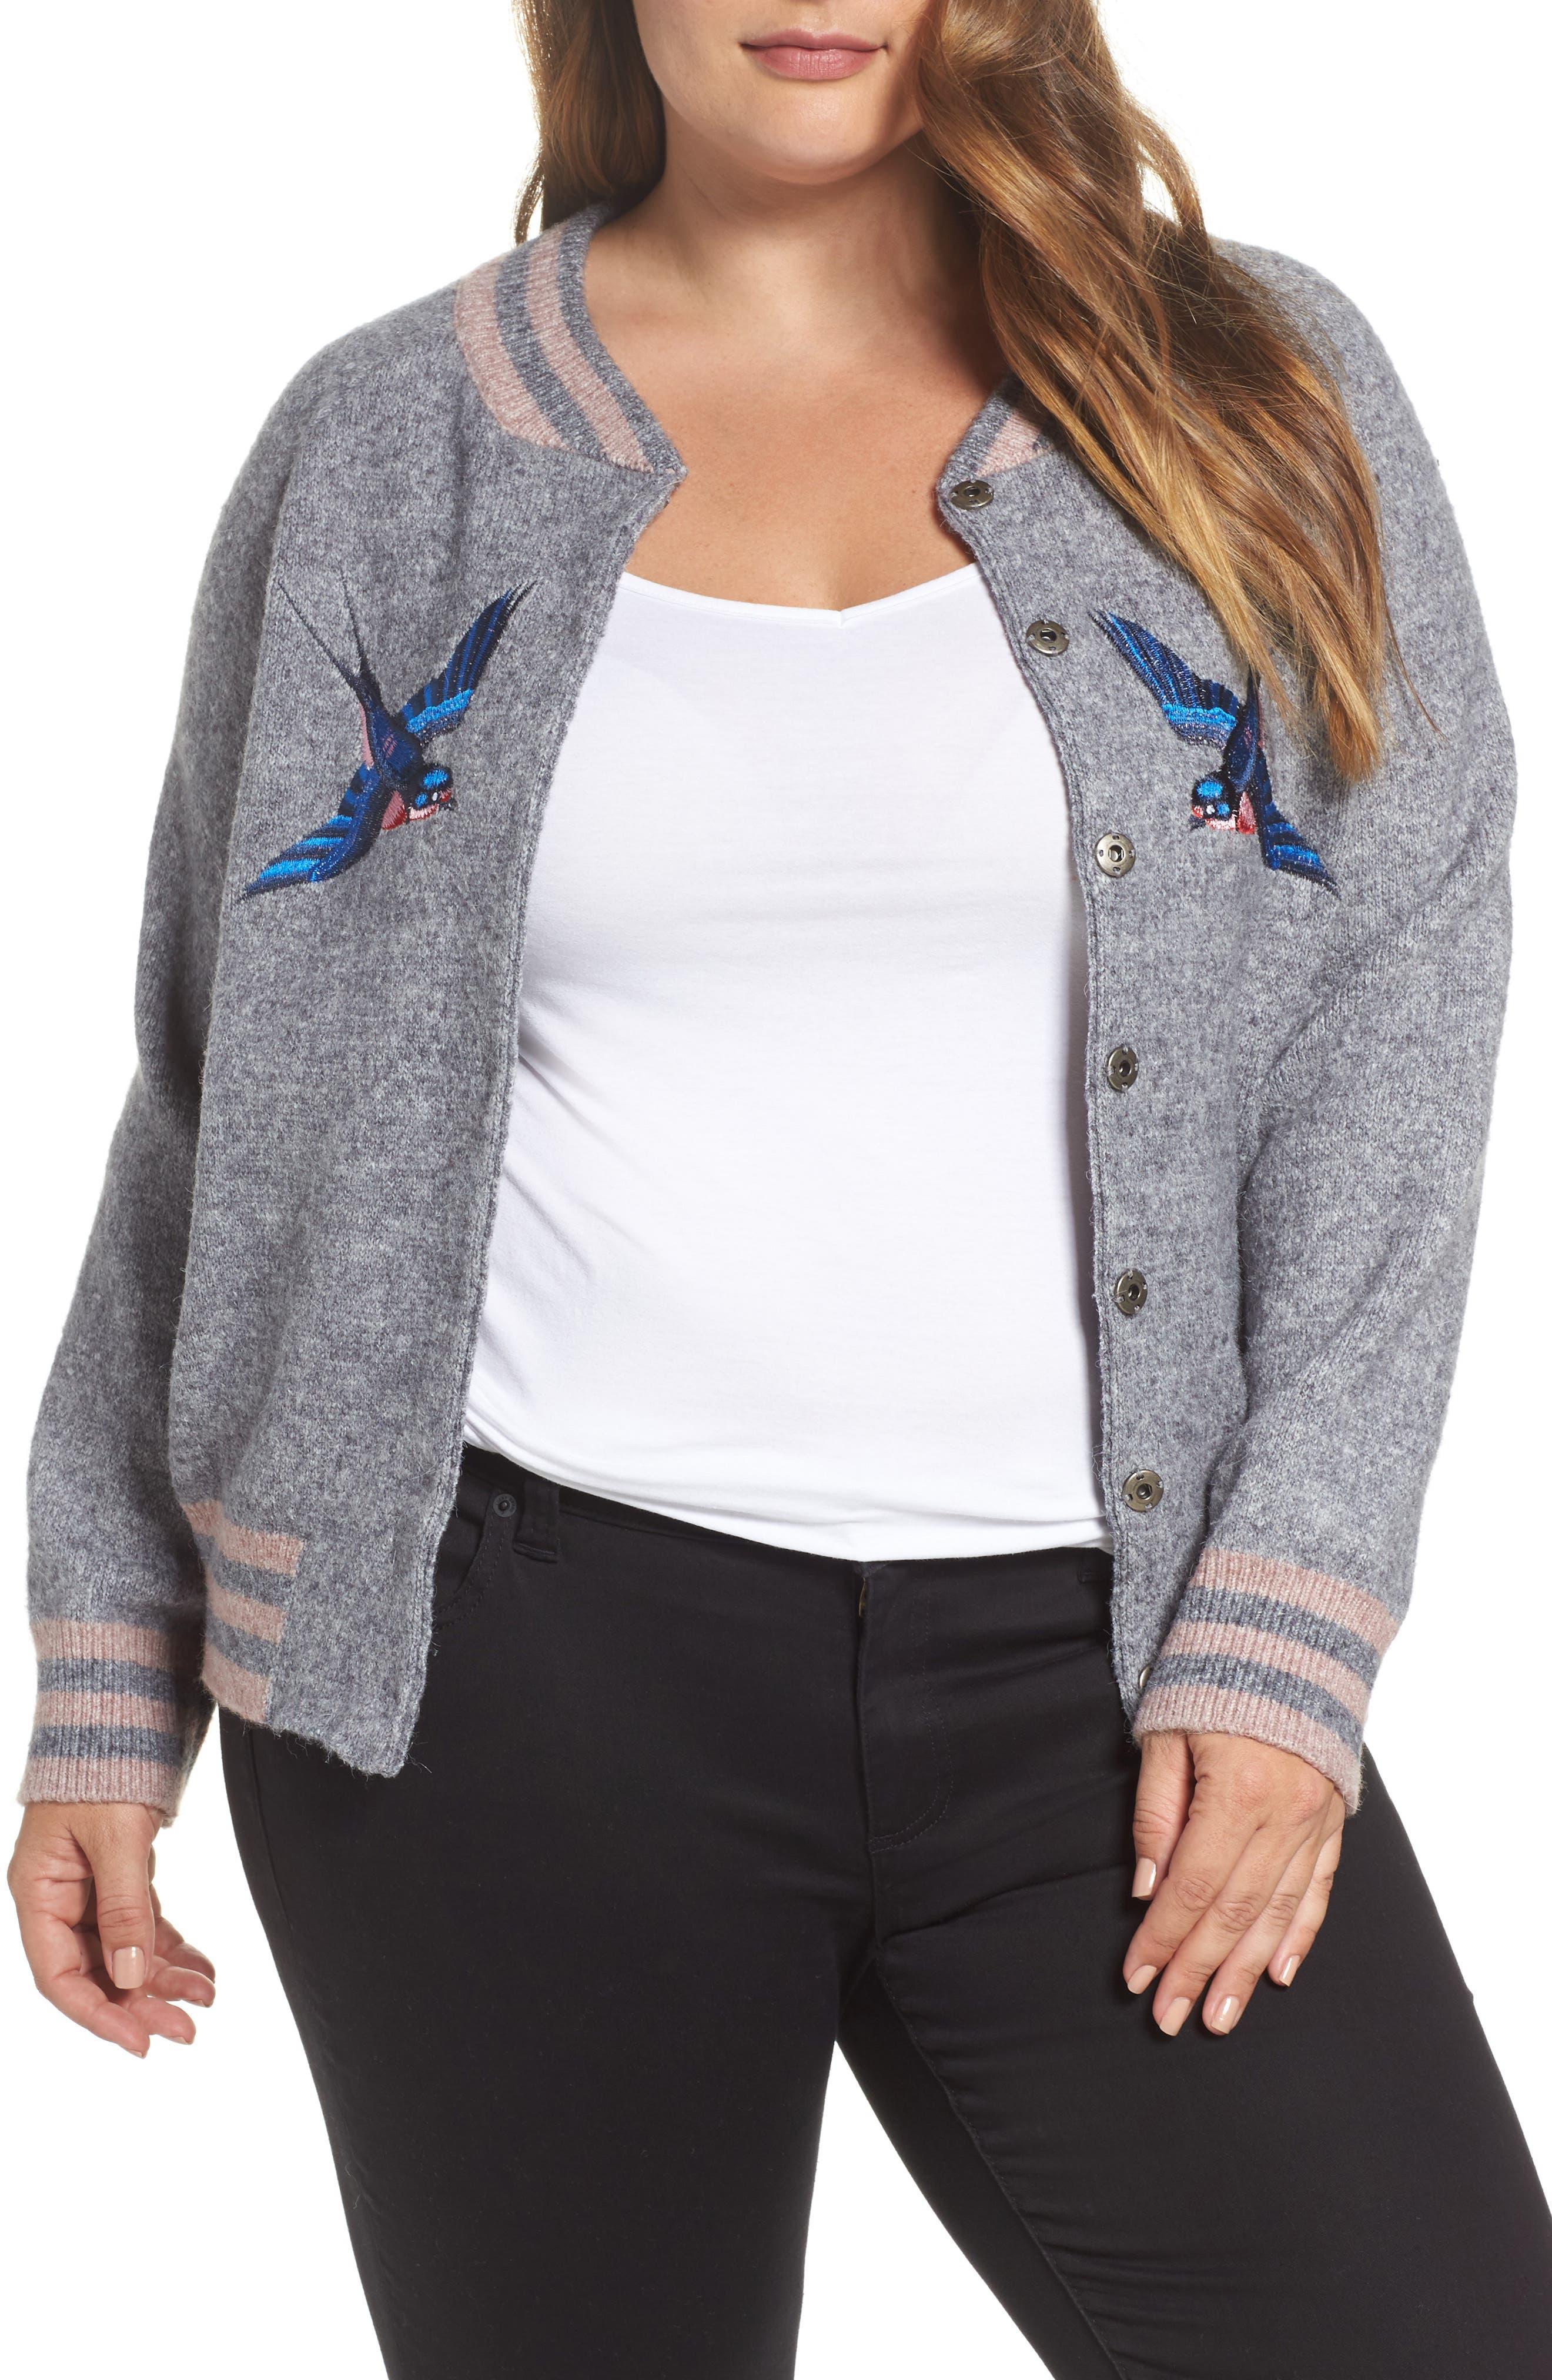 Zanja Embroidered Knit Bomber Jacket,                             Main thumbnail 1, color,                             034